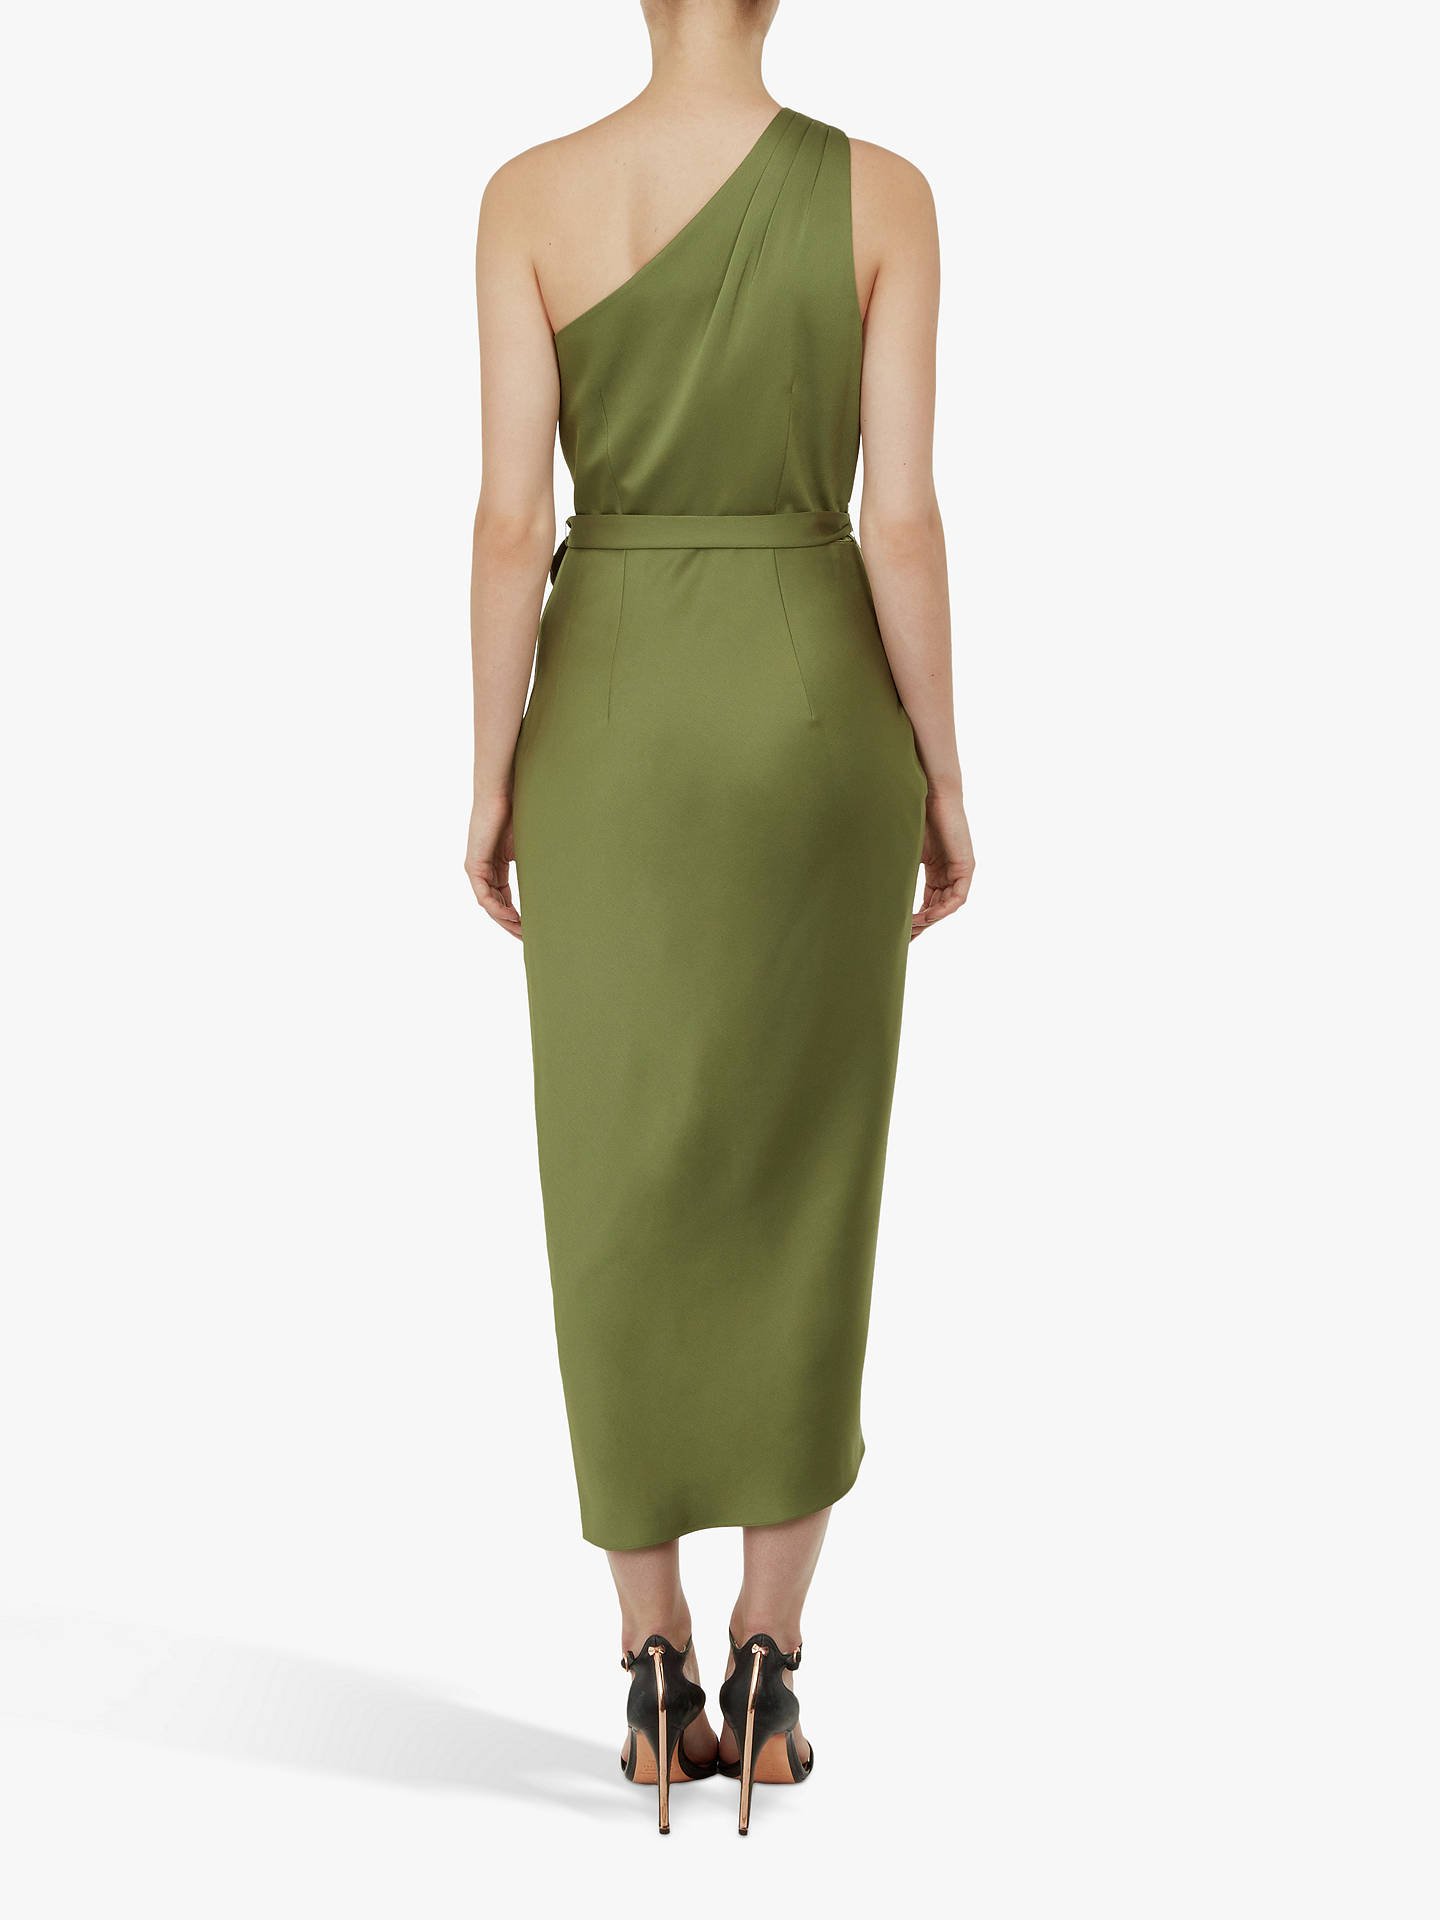 dd66305de11d ... Buy Ted Baker Gabie Tie Waist One Shoulder Dress